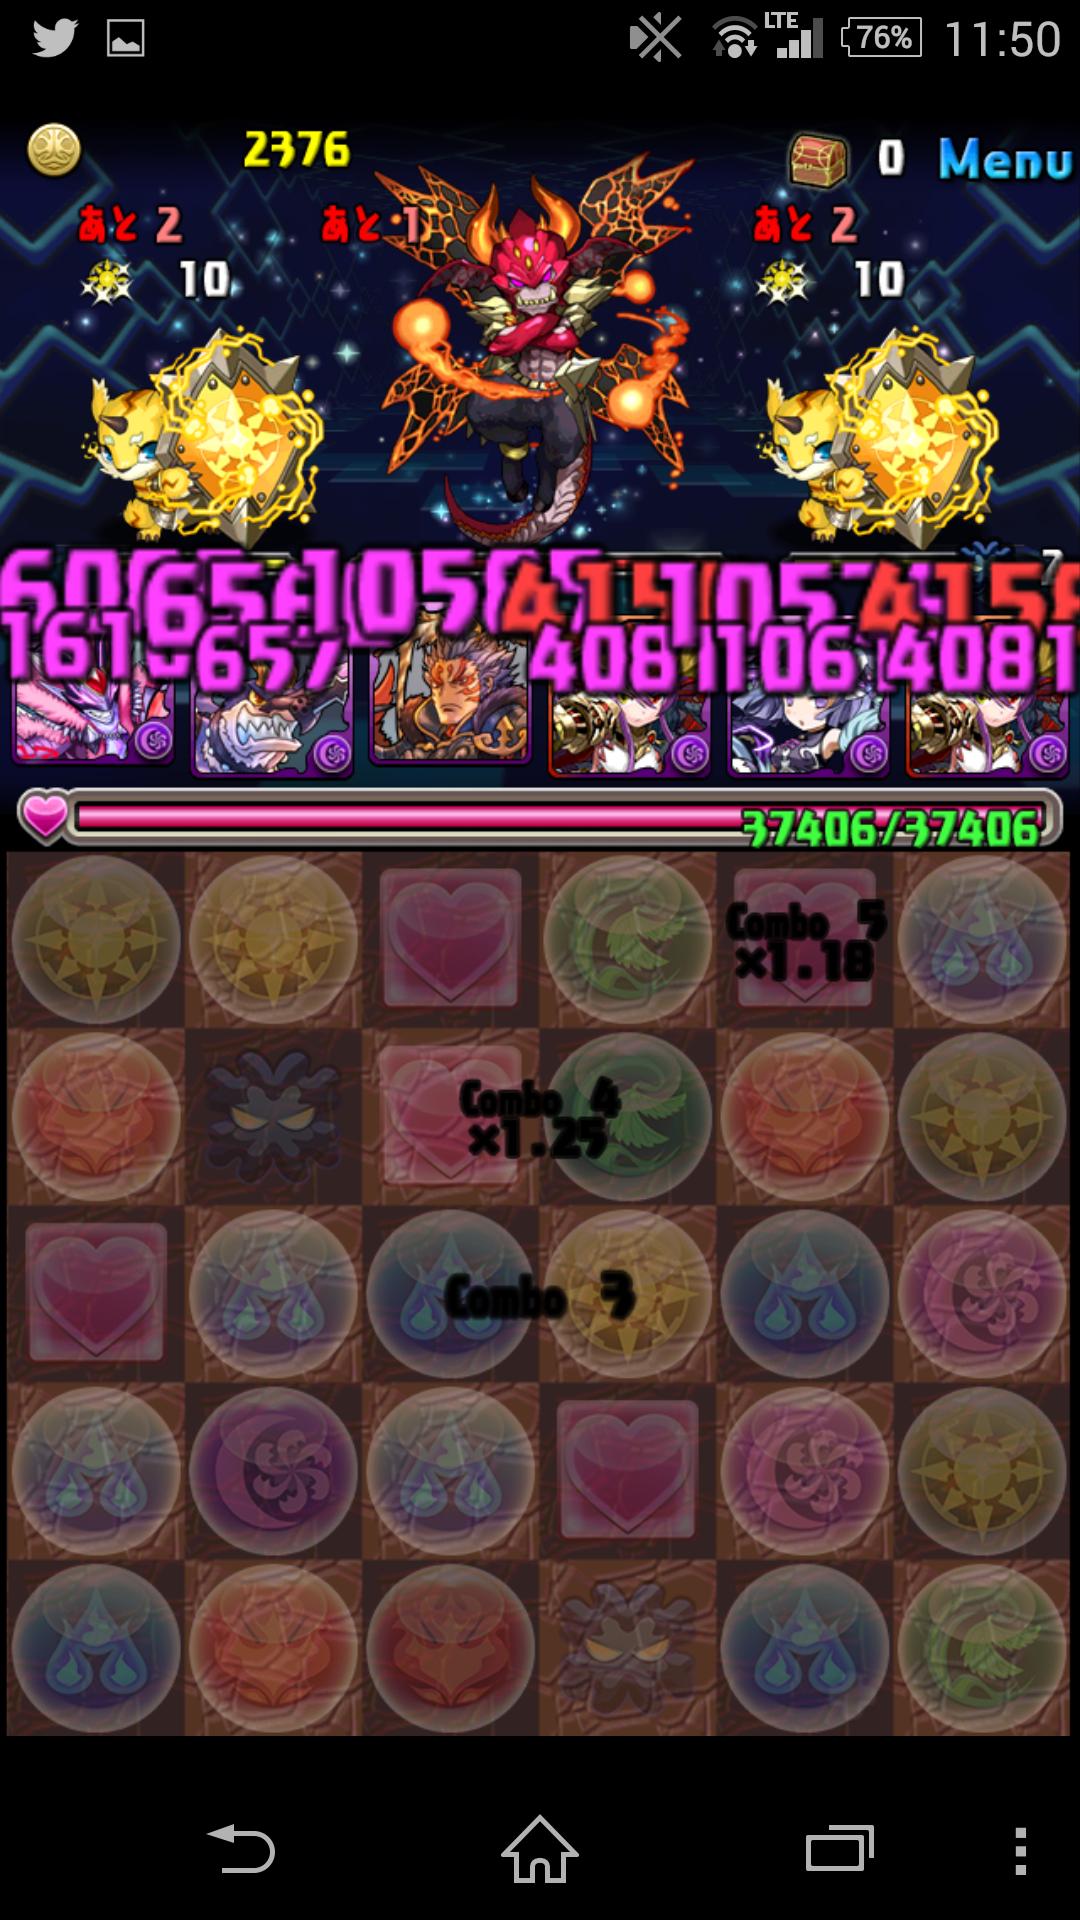 Screenshot_2014-12-18-11-50-23.png